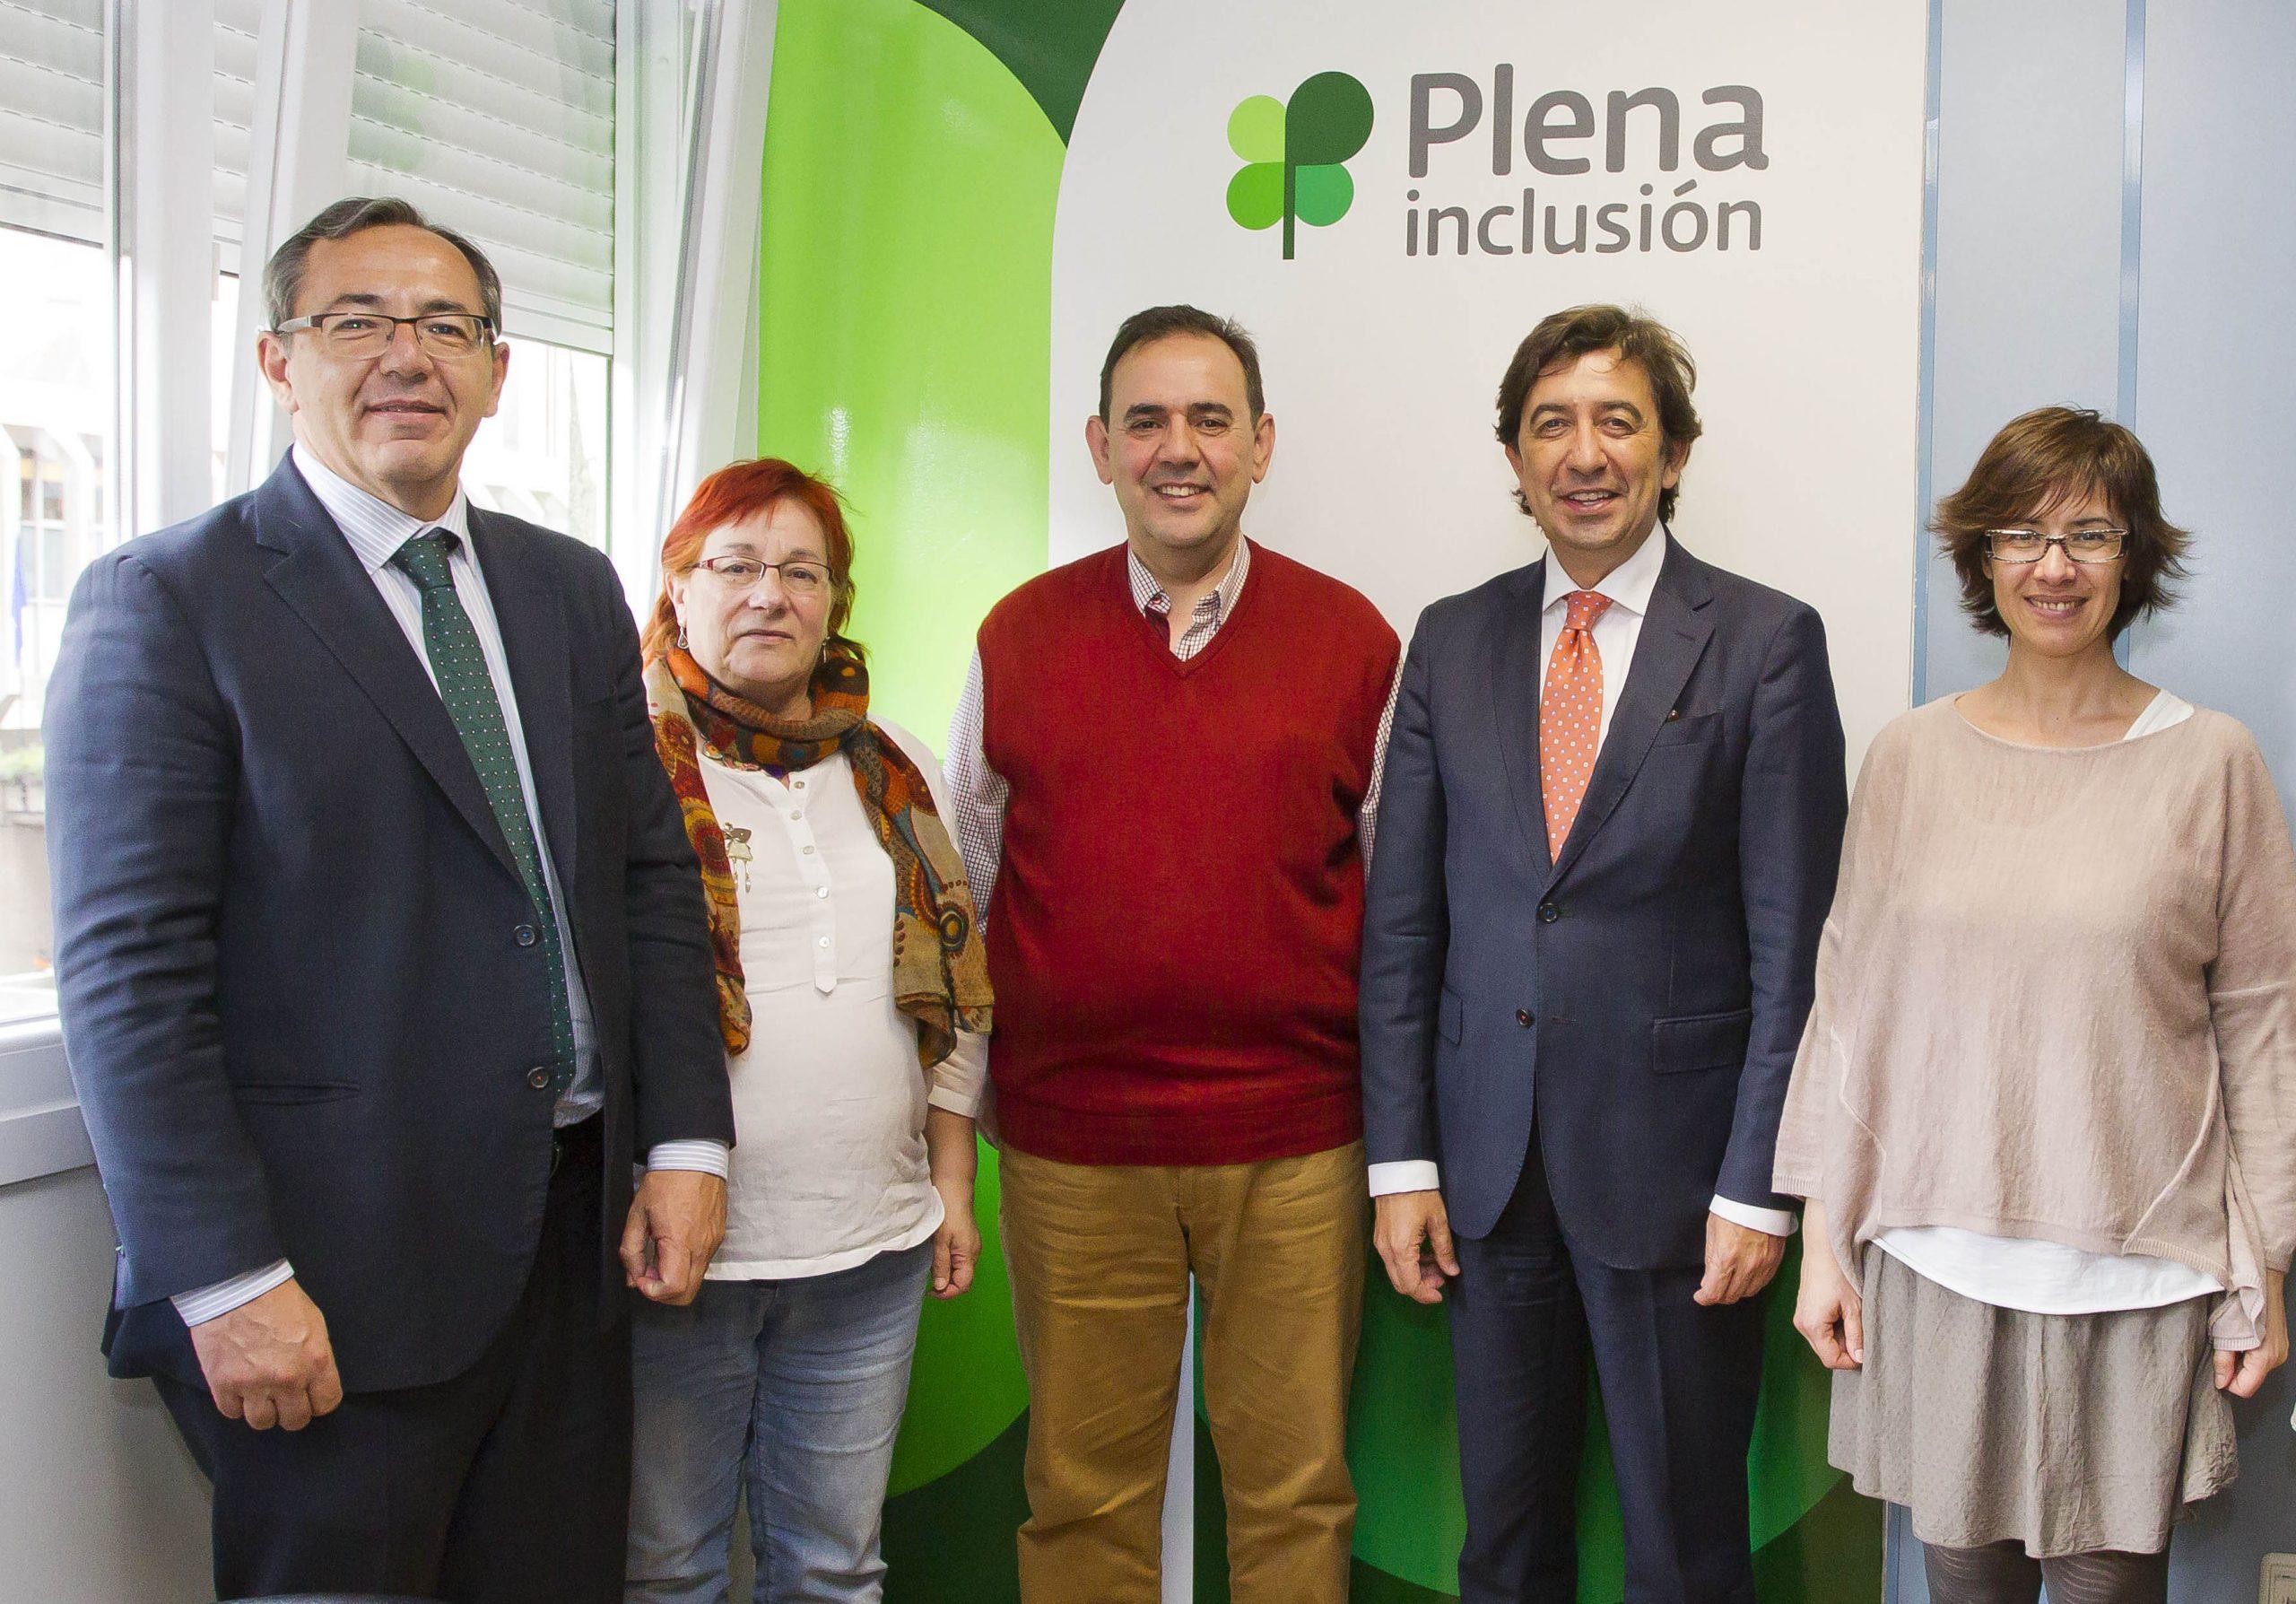 centrofpn_plenainclusion03